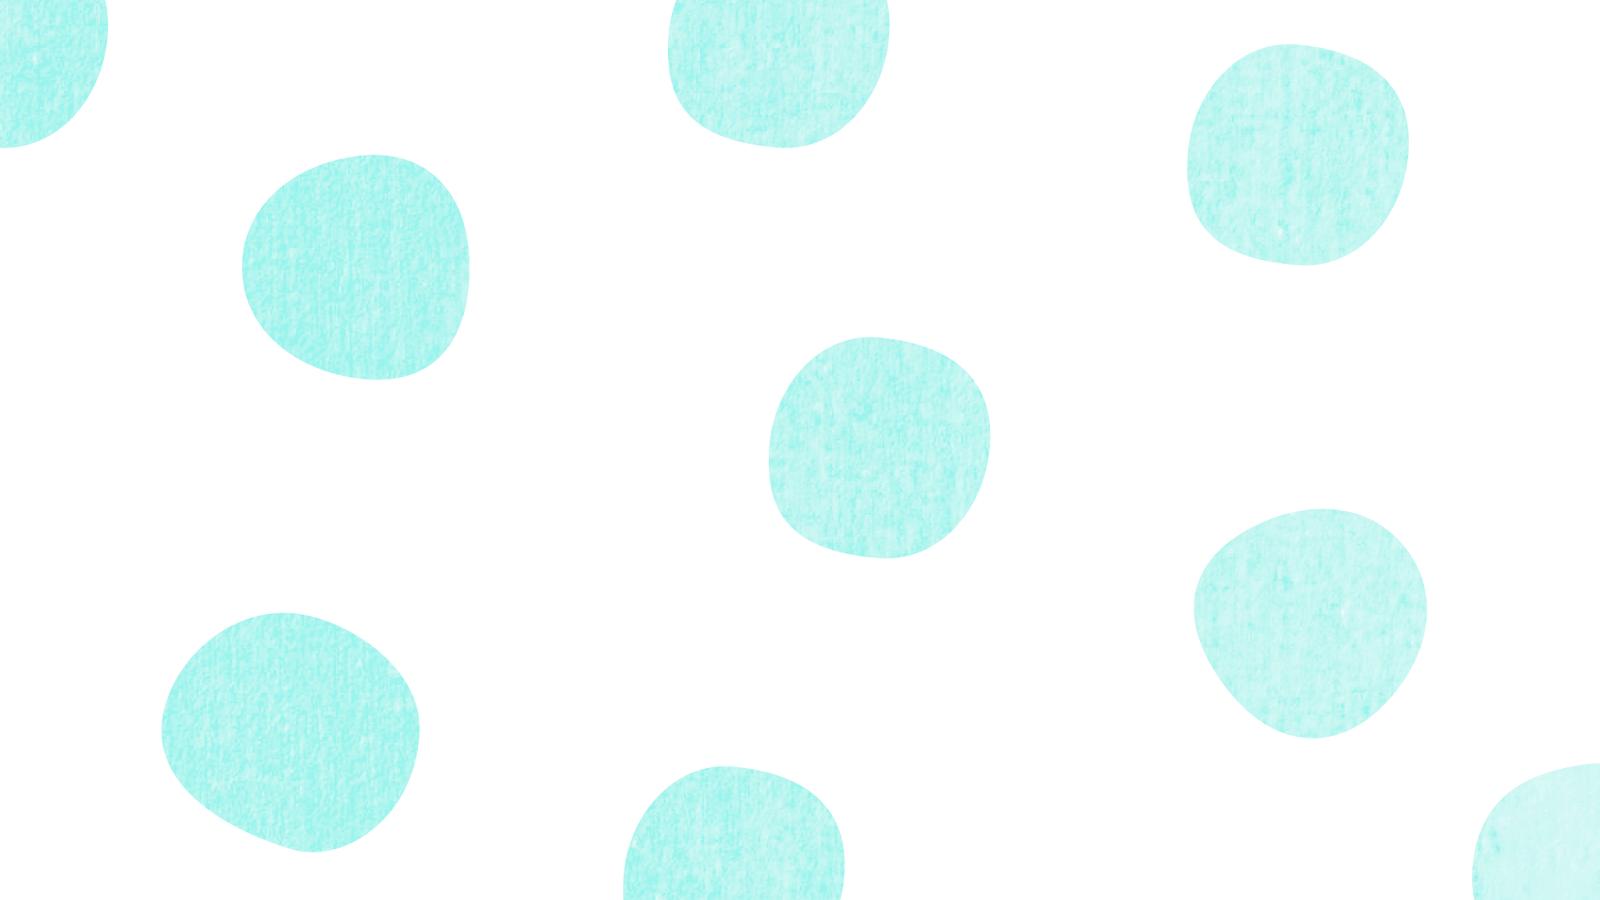 freepolka dot desktop